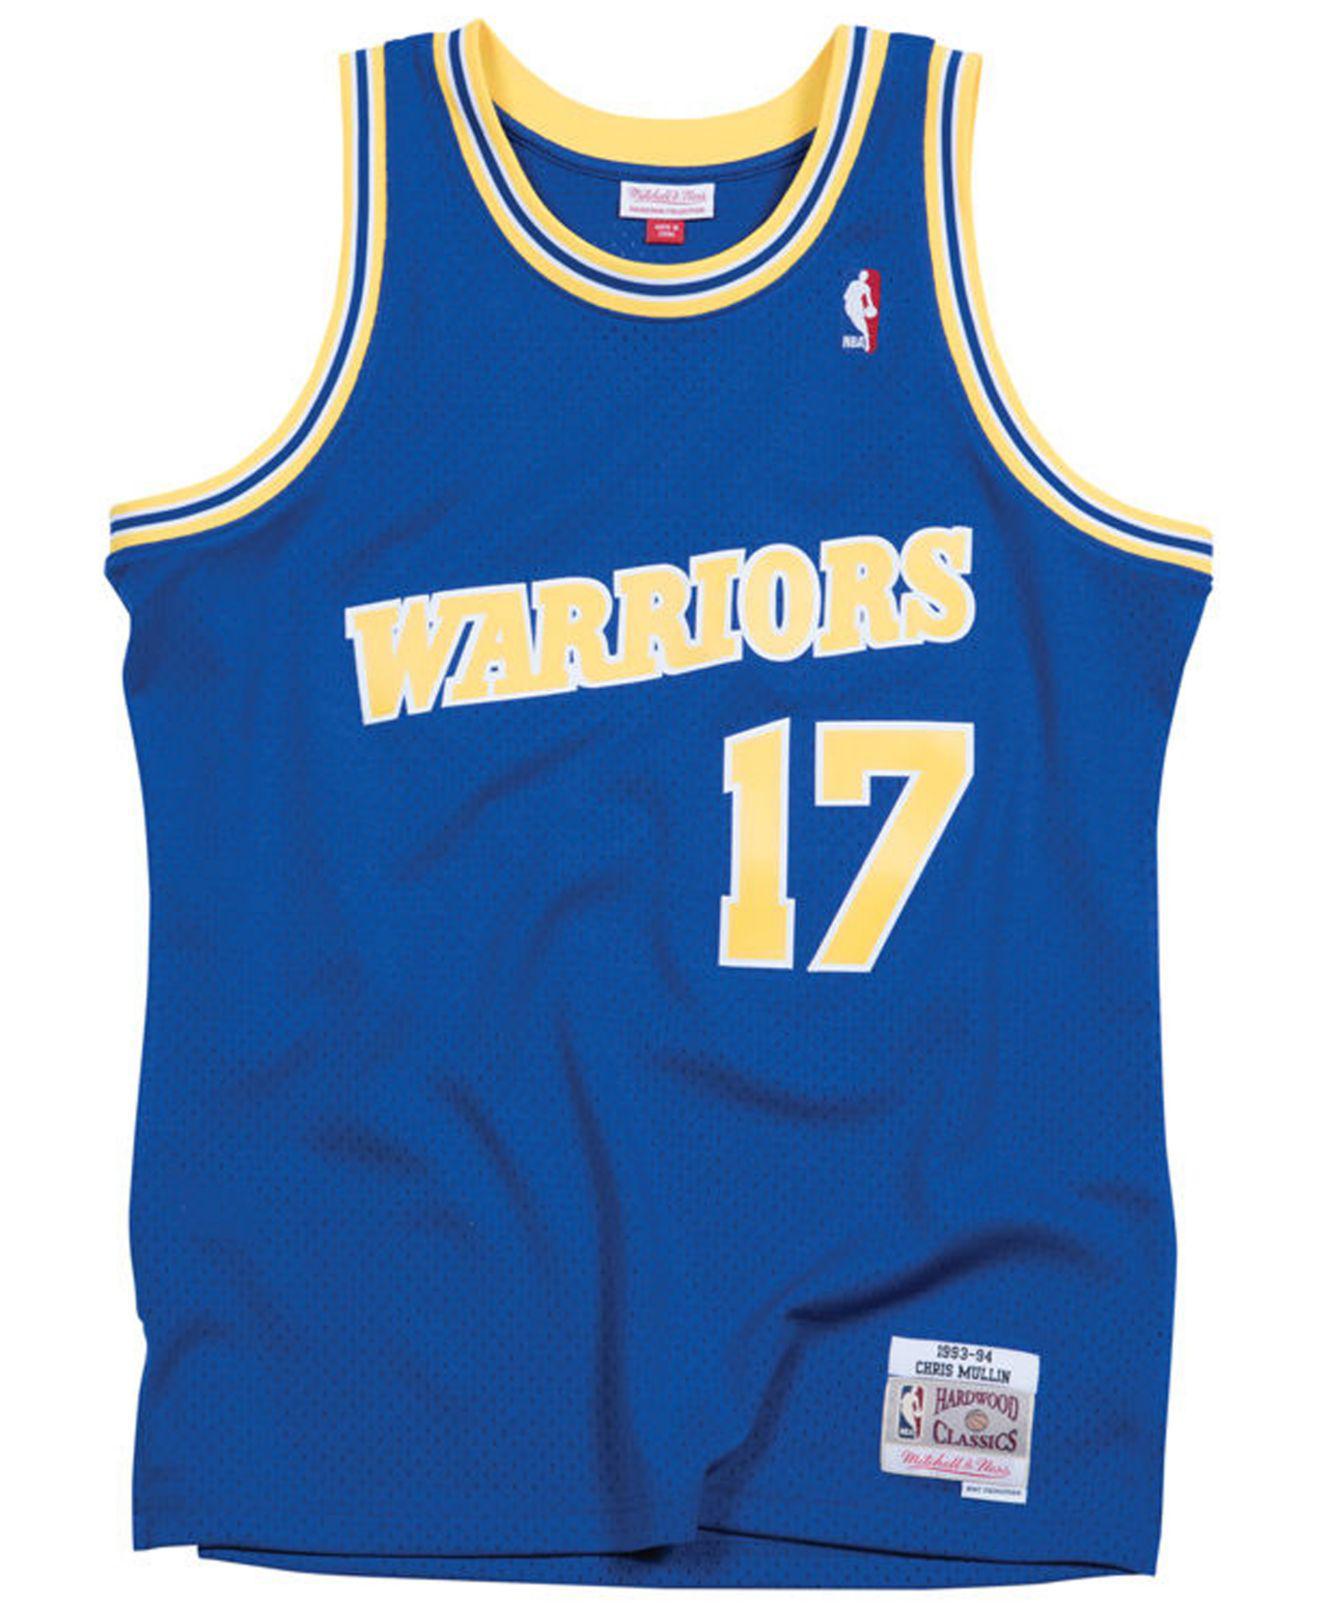 new styles 77e13 10ce2 Mitchell & Ness Chris Mullin Golden State Warriors Hardwood ...